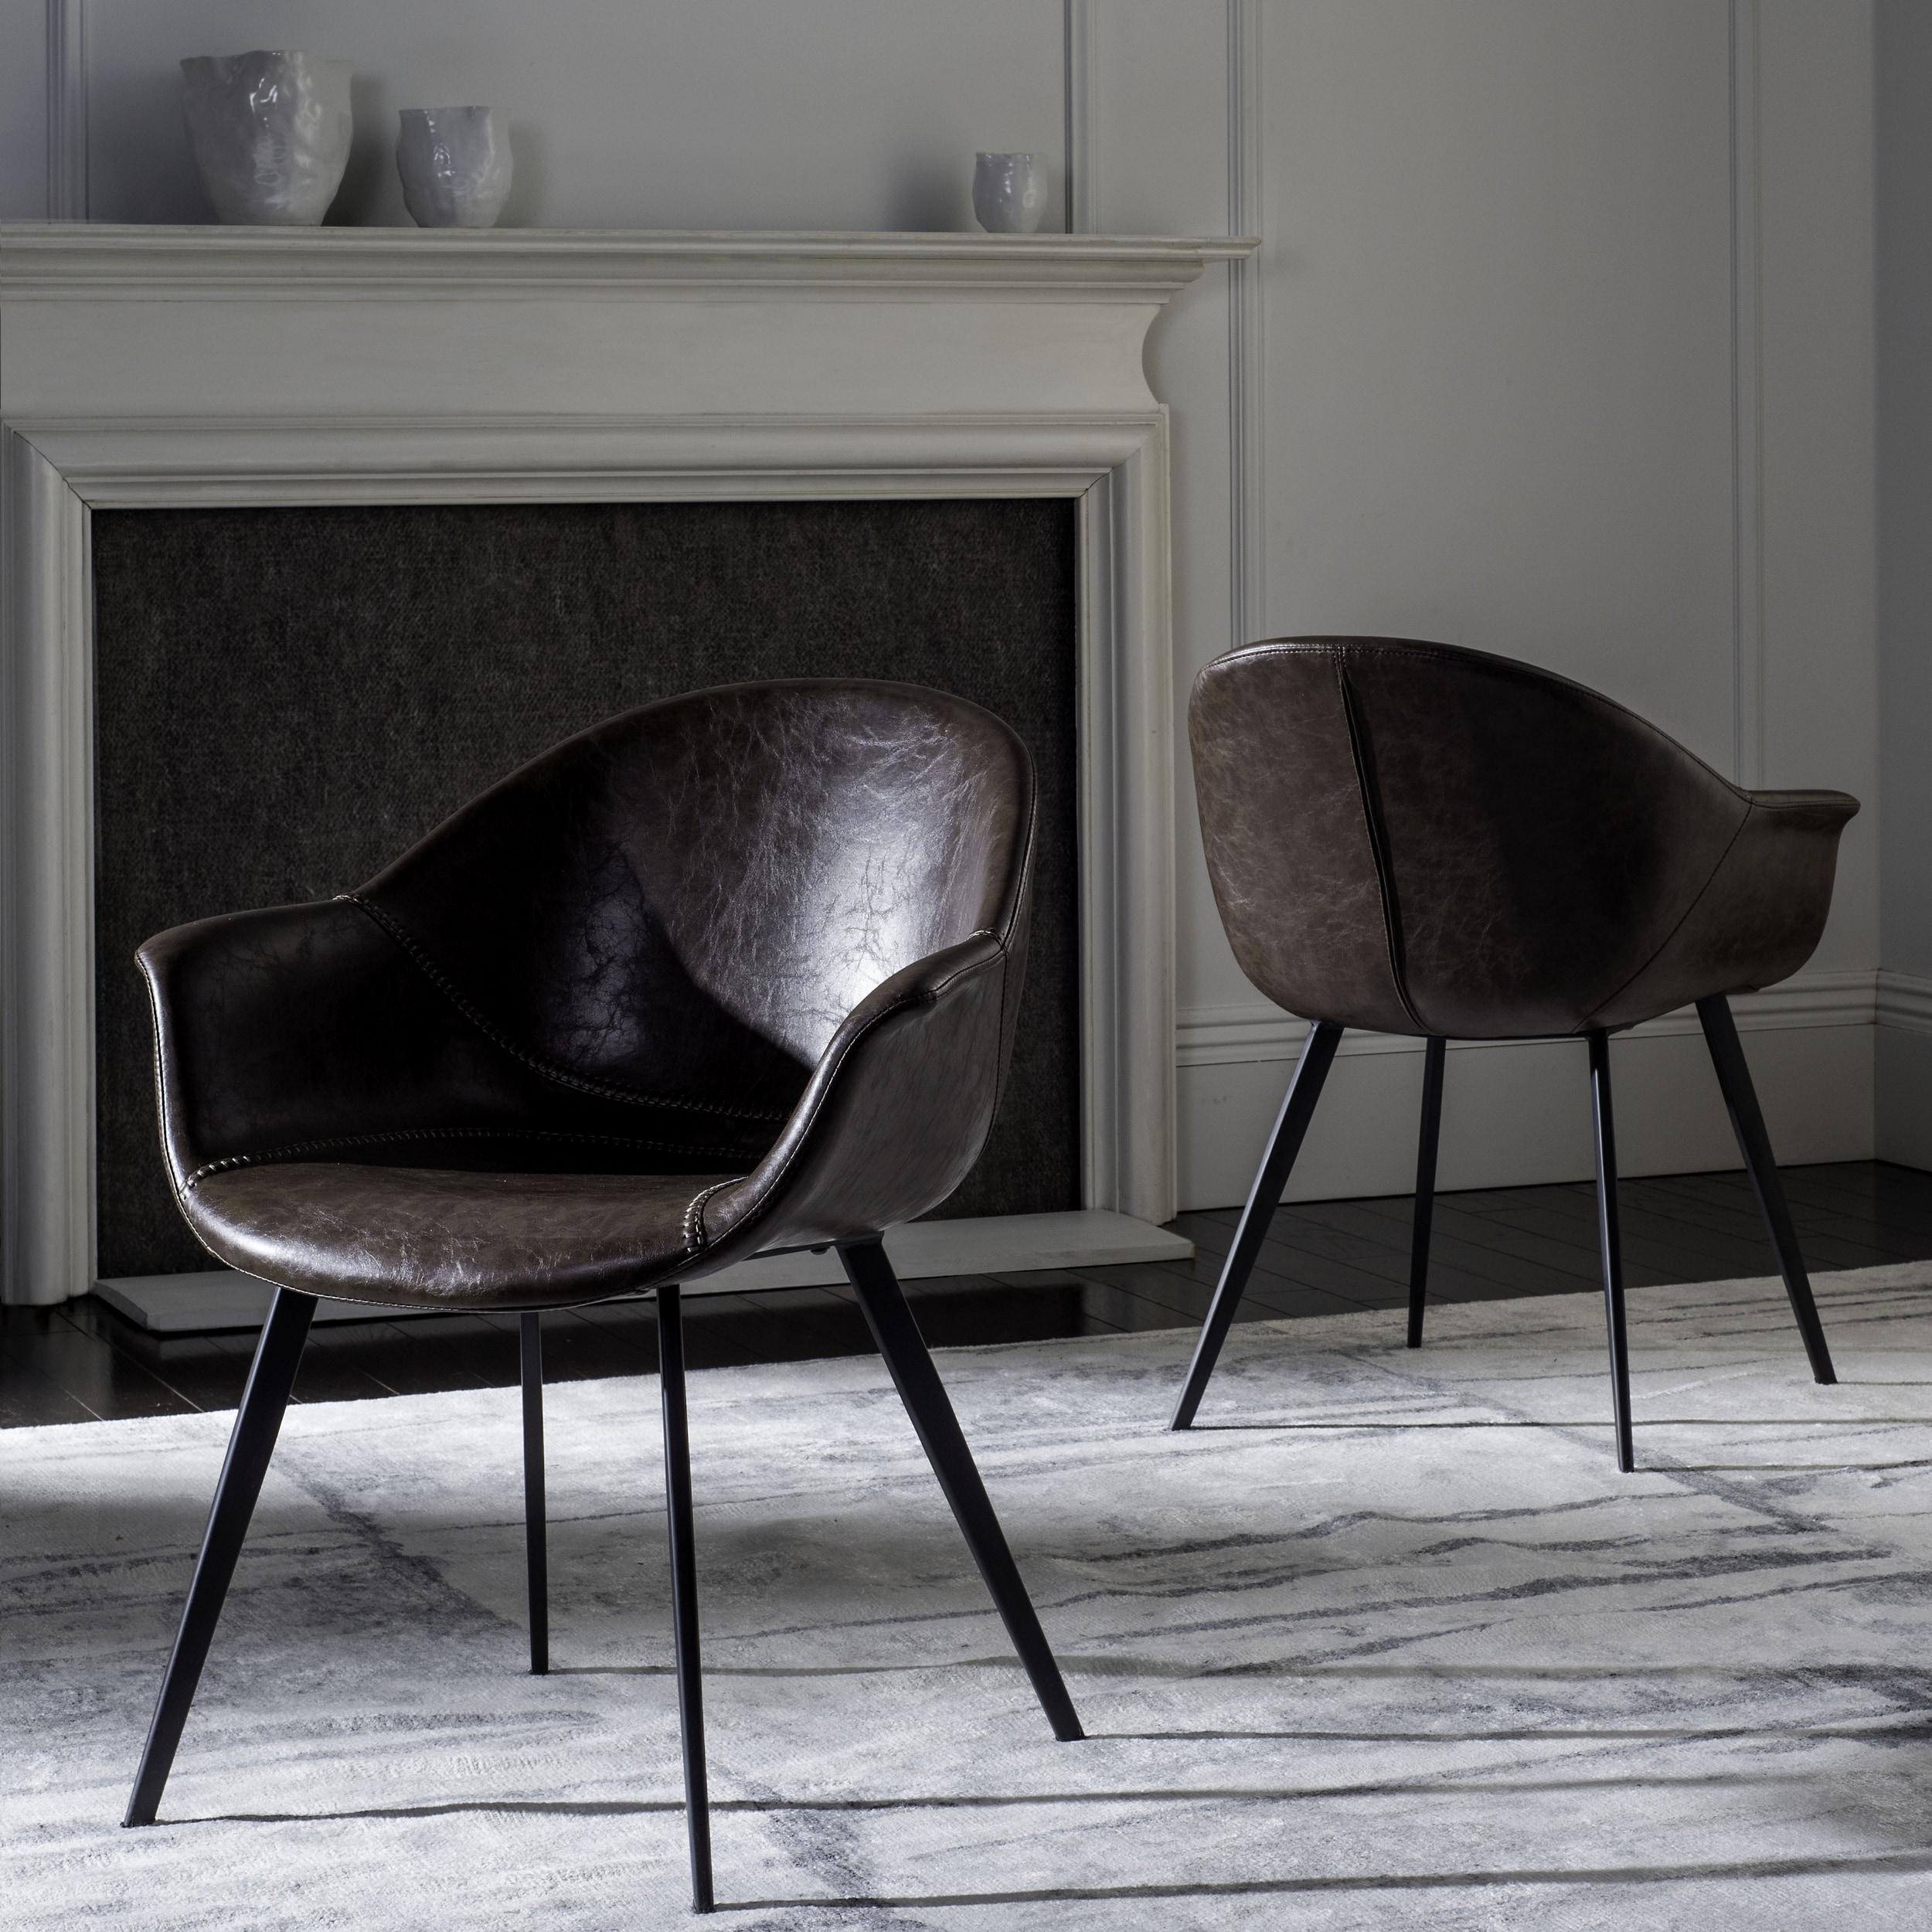 Brilliant Safavieh Dublin Mid Century Modern Leather Dining Tub Chairdark Brown Black Dining Chair Set Of 2 Squirreltailoven Fun Painted Chair Ideas Images Squirreltailovenorg